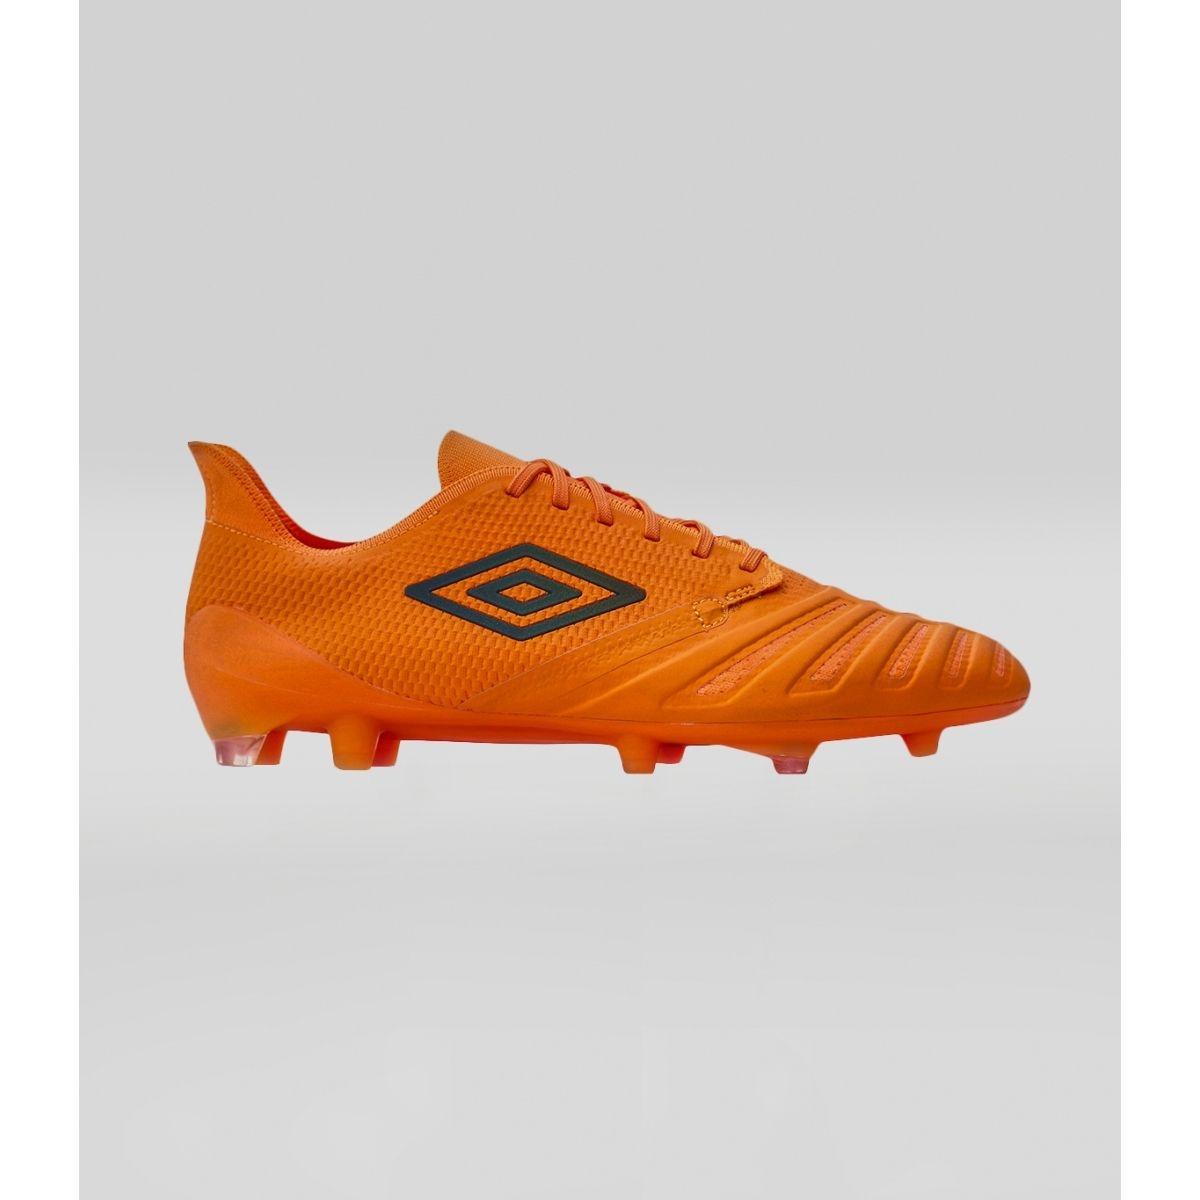 Chaussures de foot  POLYURETHANE Homme Chaussures De Football Ux Accuro 3